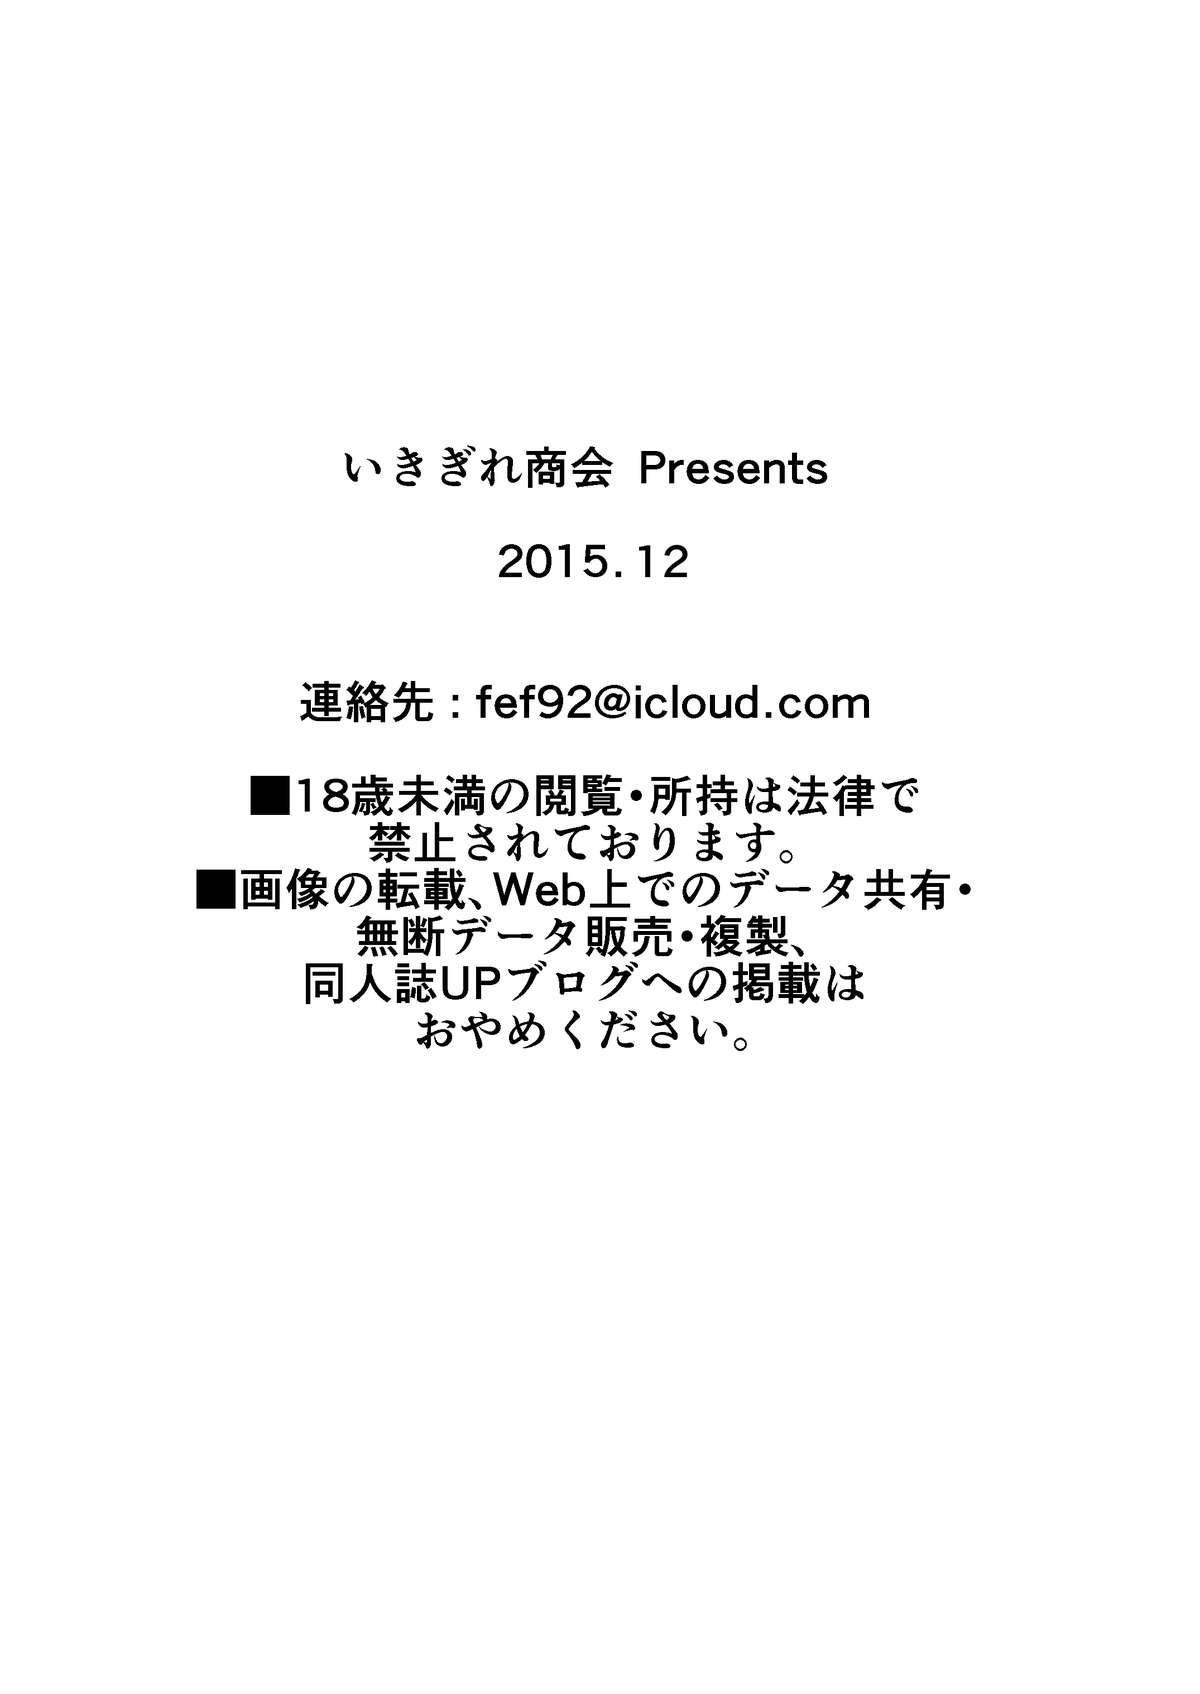 Inma Toubatsu Daisakusen Episode 3 20